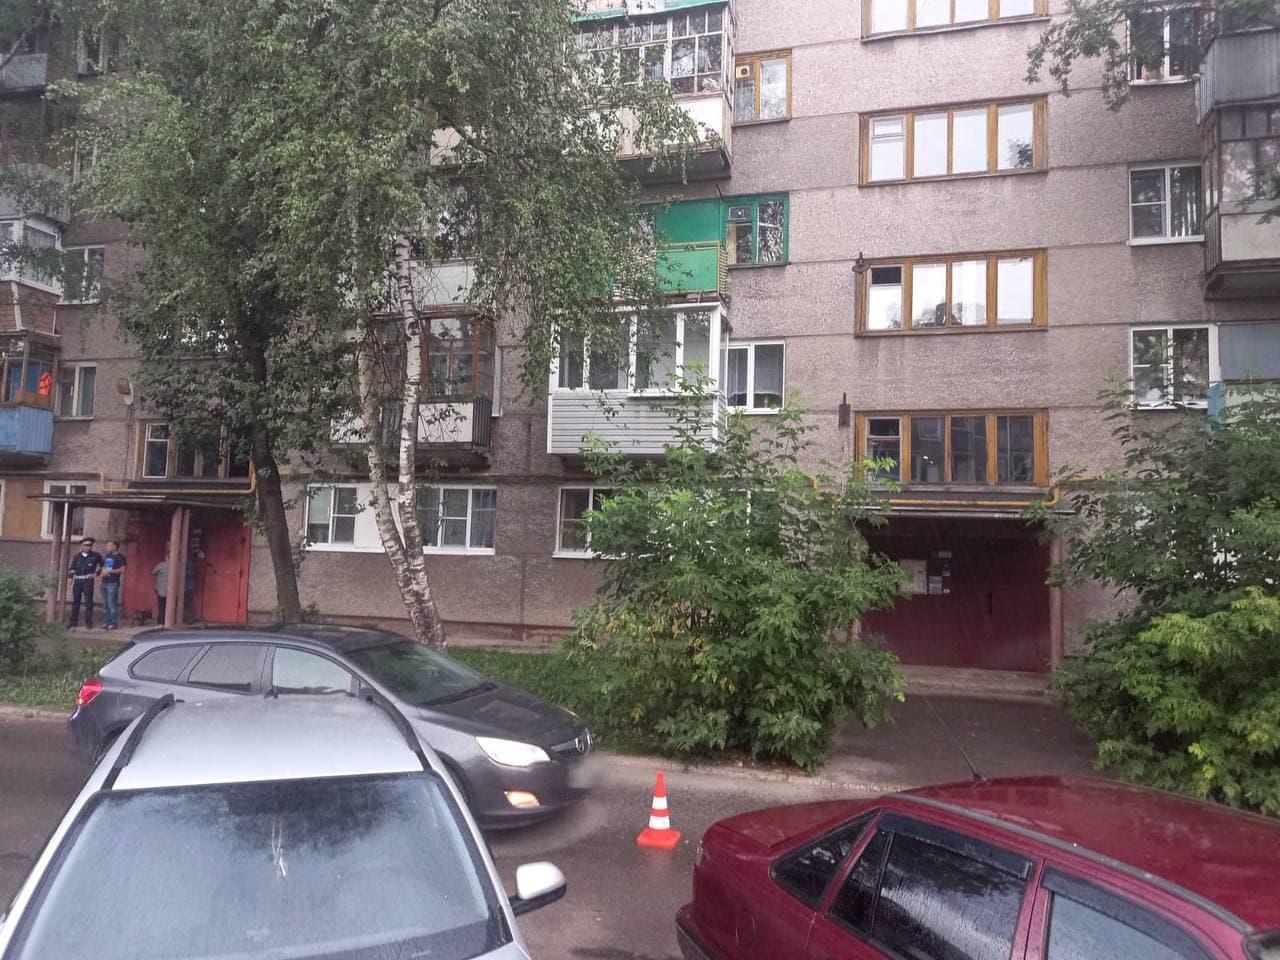 9-летняя девочка во дворе дома в Череповце попала под колеса иномарки